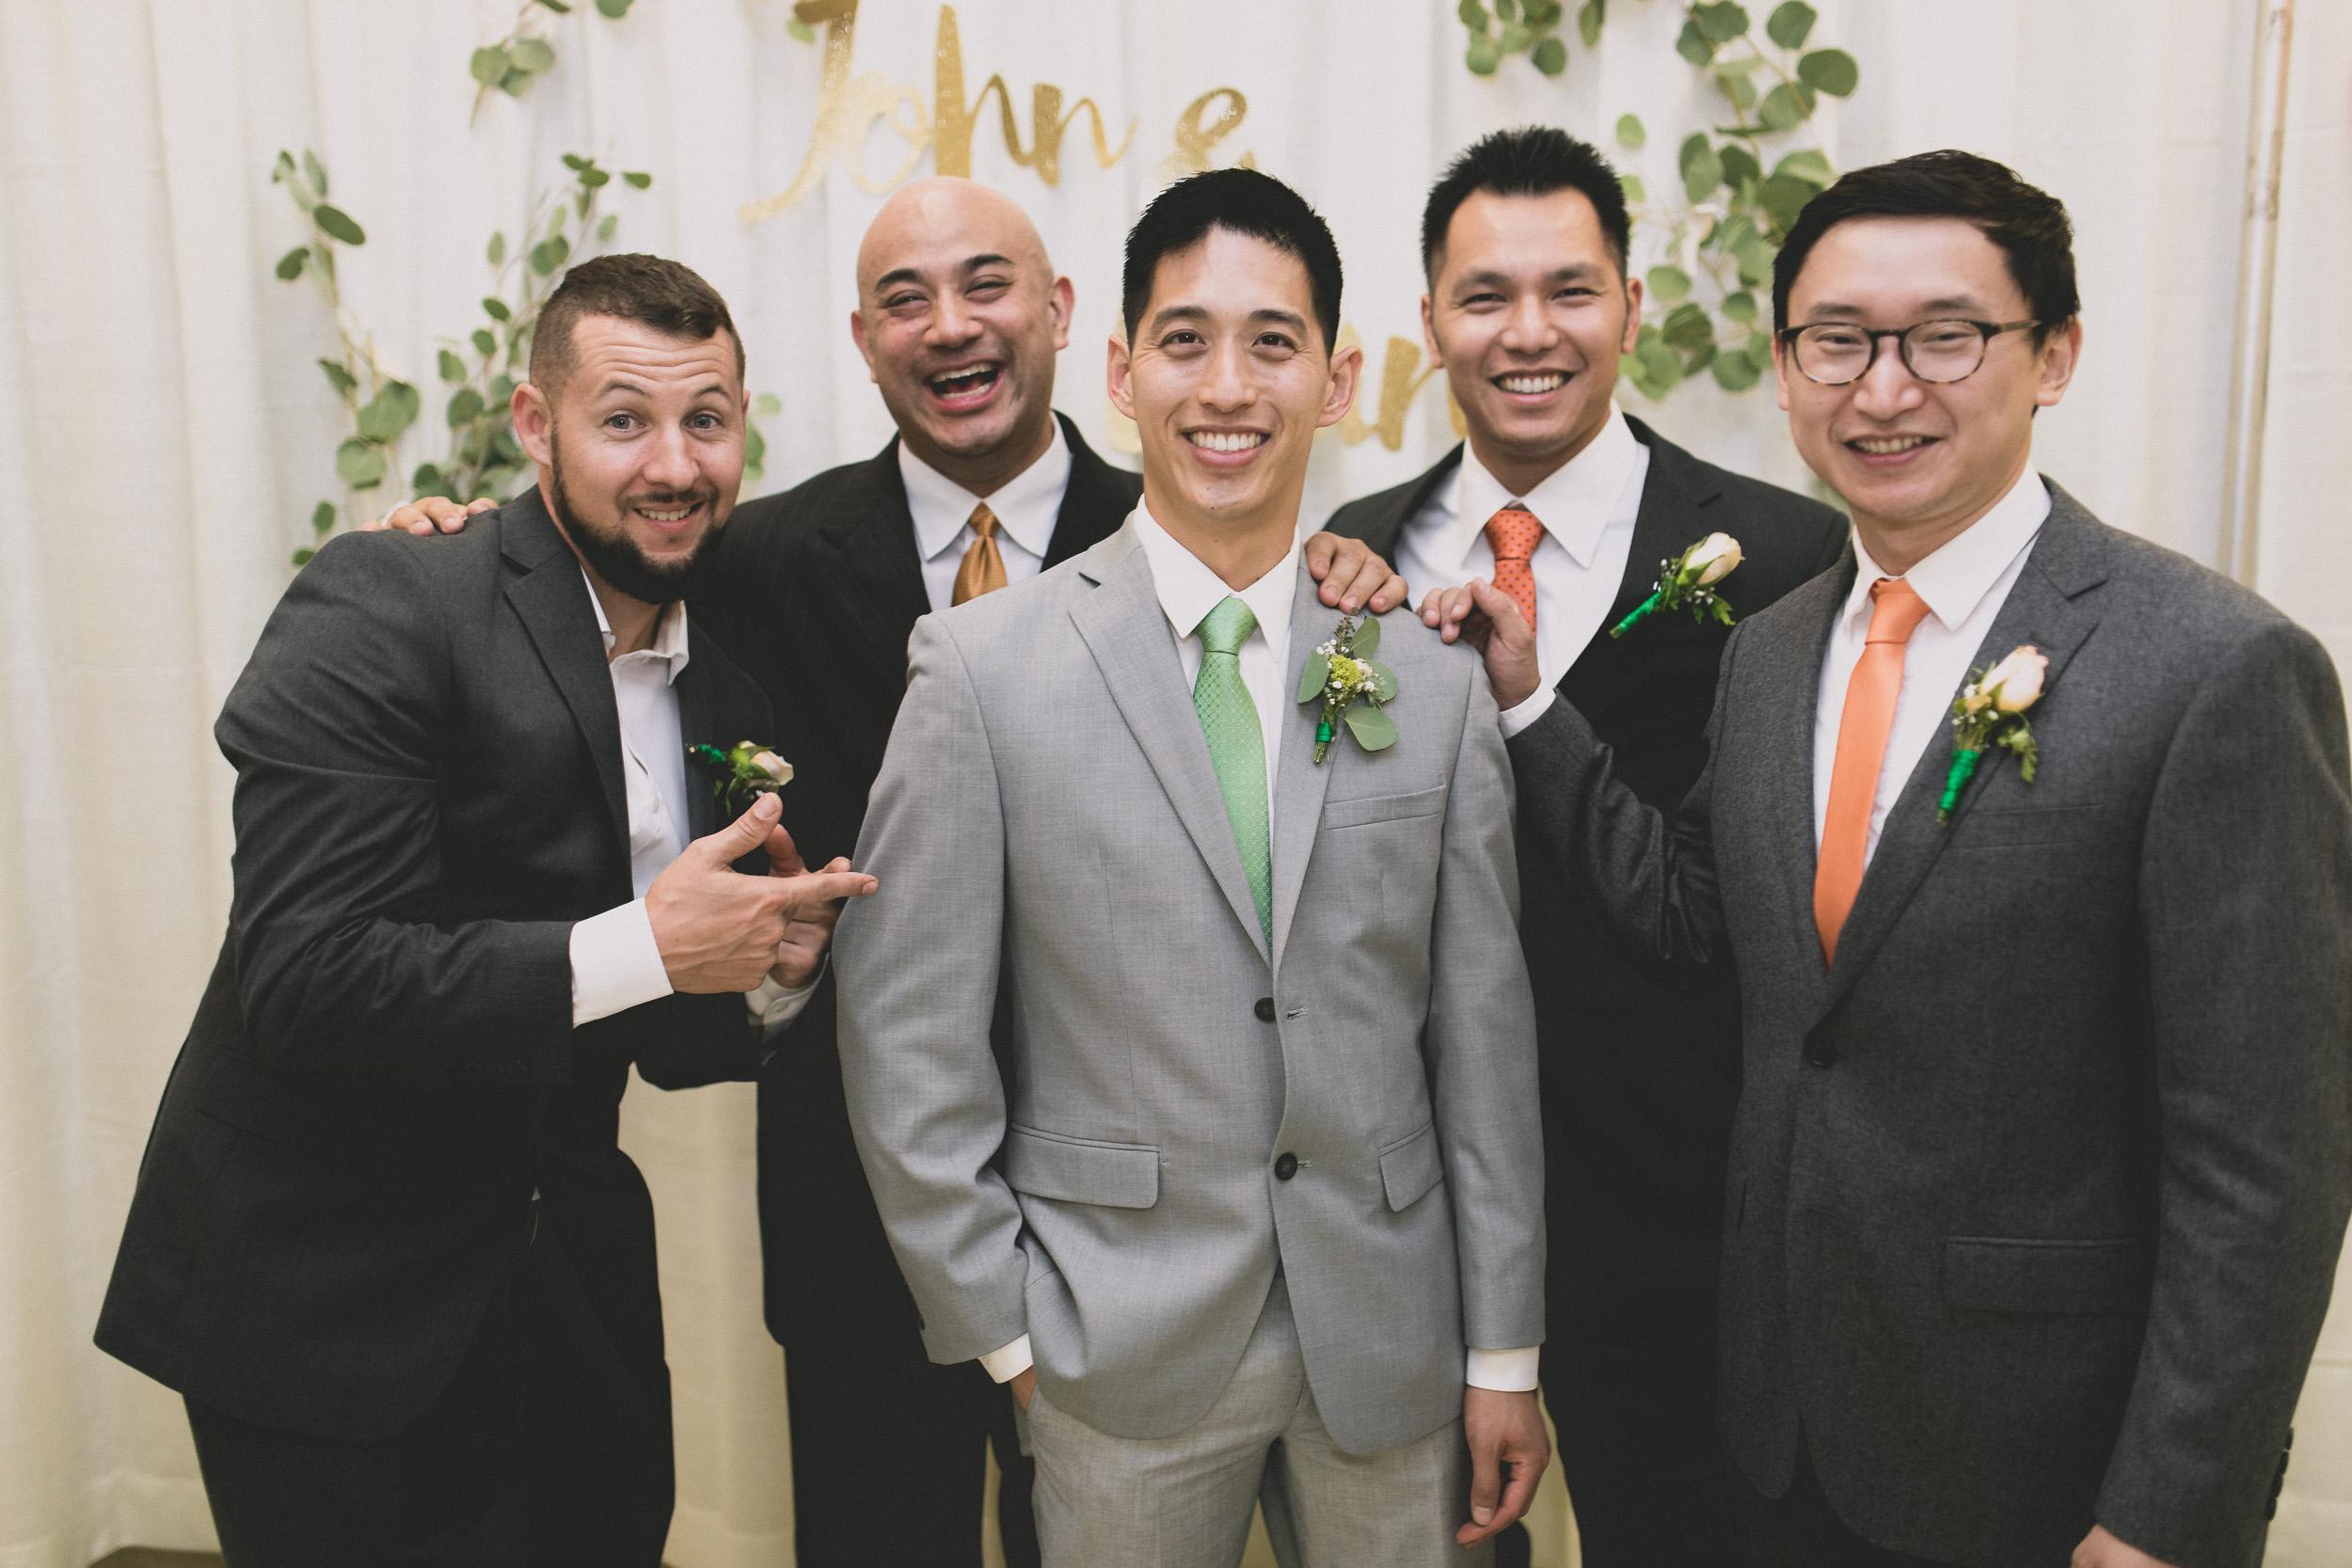 Johlean Wedding Web-90.jpg